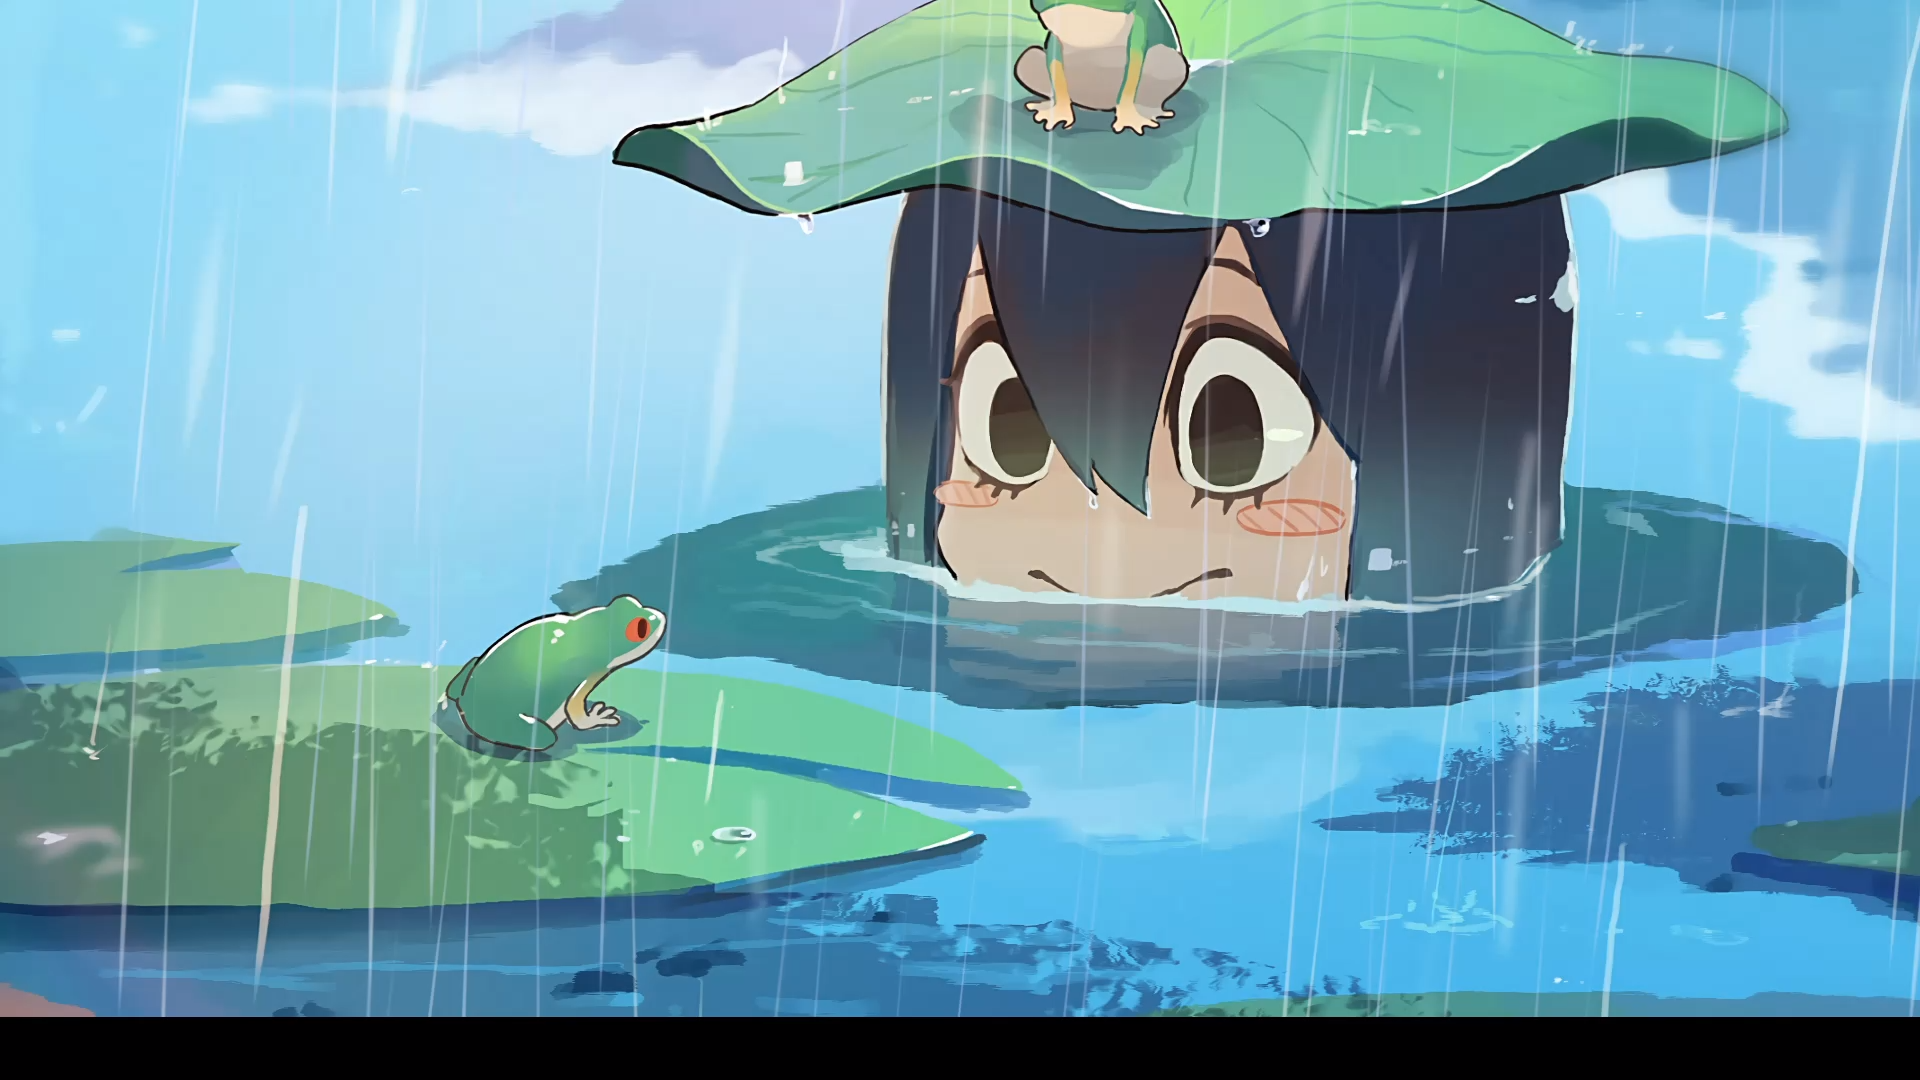 Froppy (My Hero Academia / Boku no Hero Academia) Anime Wallpaper